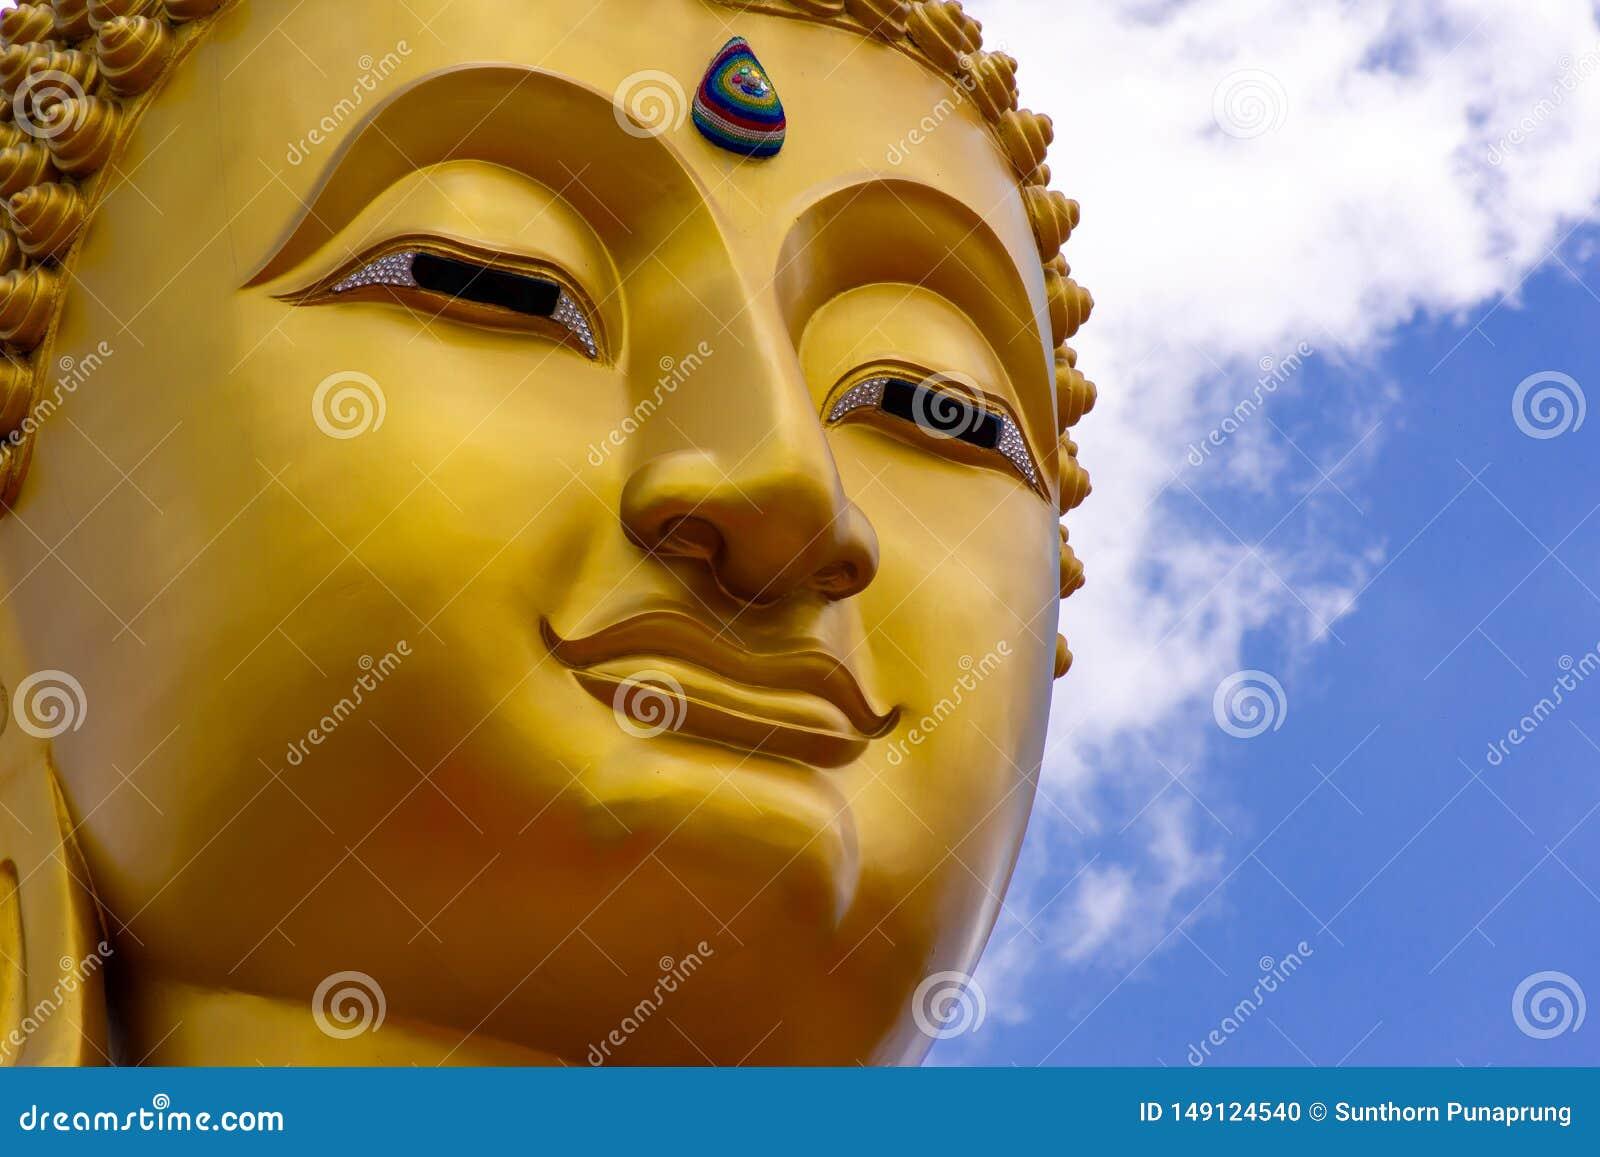 Imagen de la estatua de Buda en Tailandia